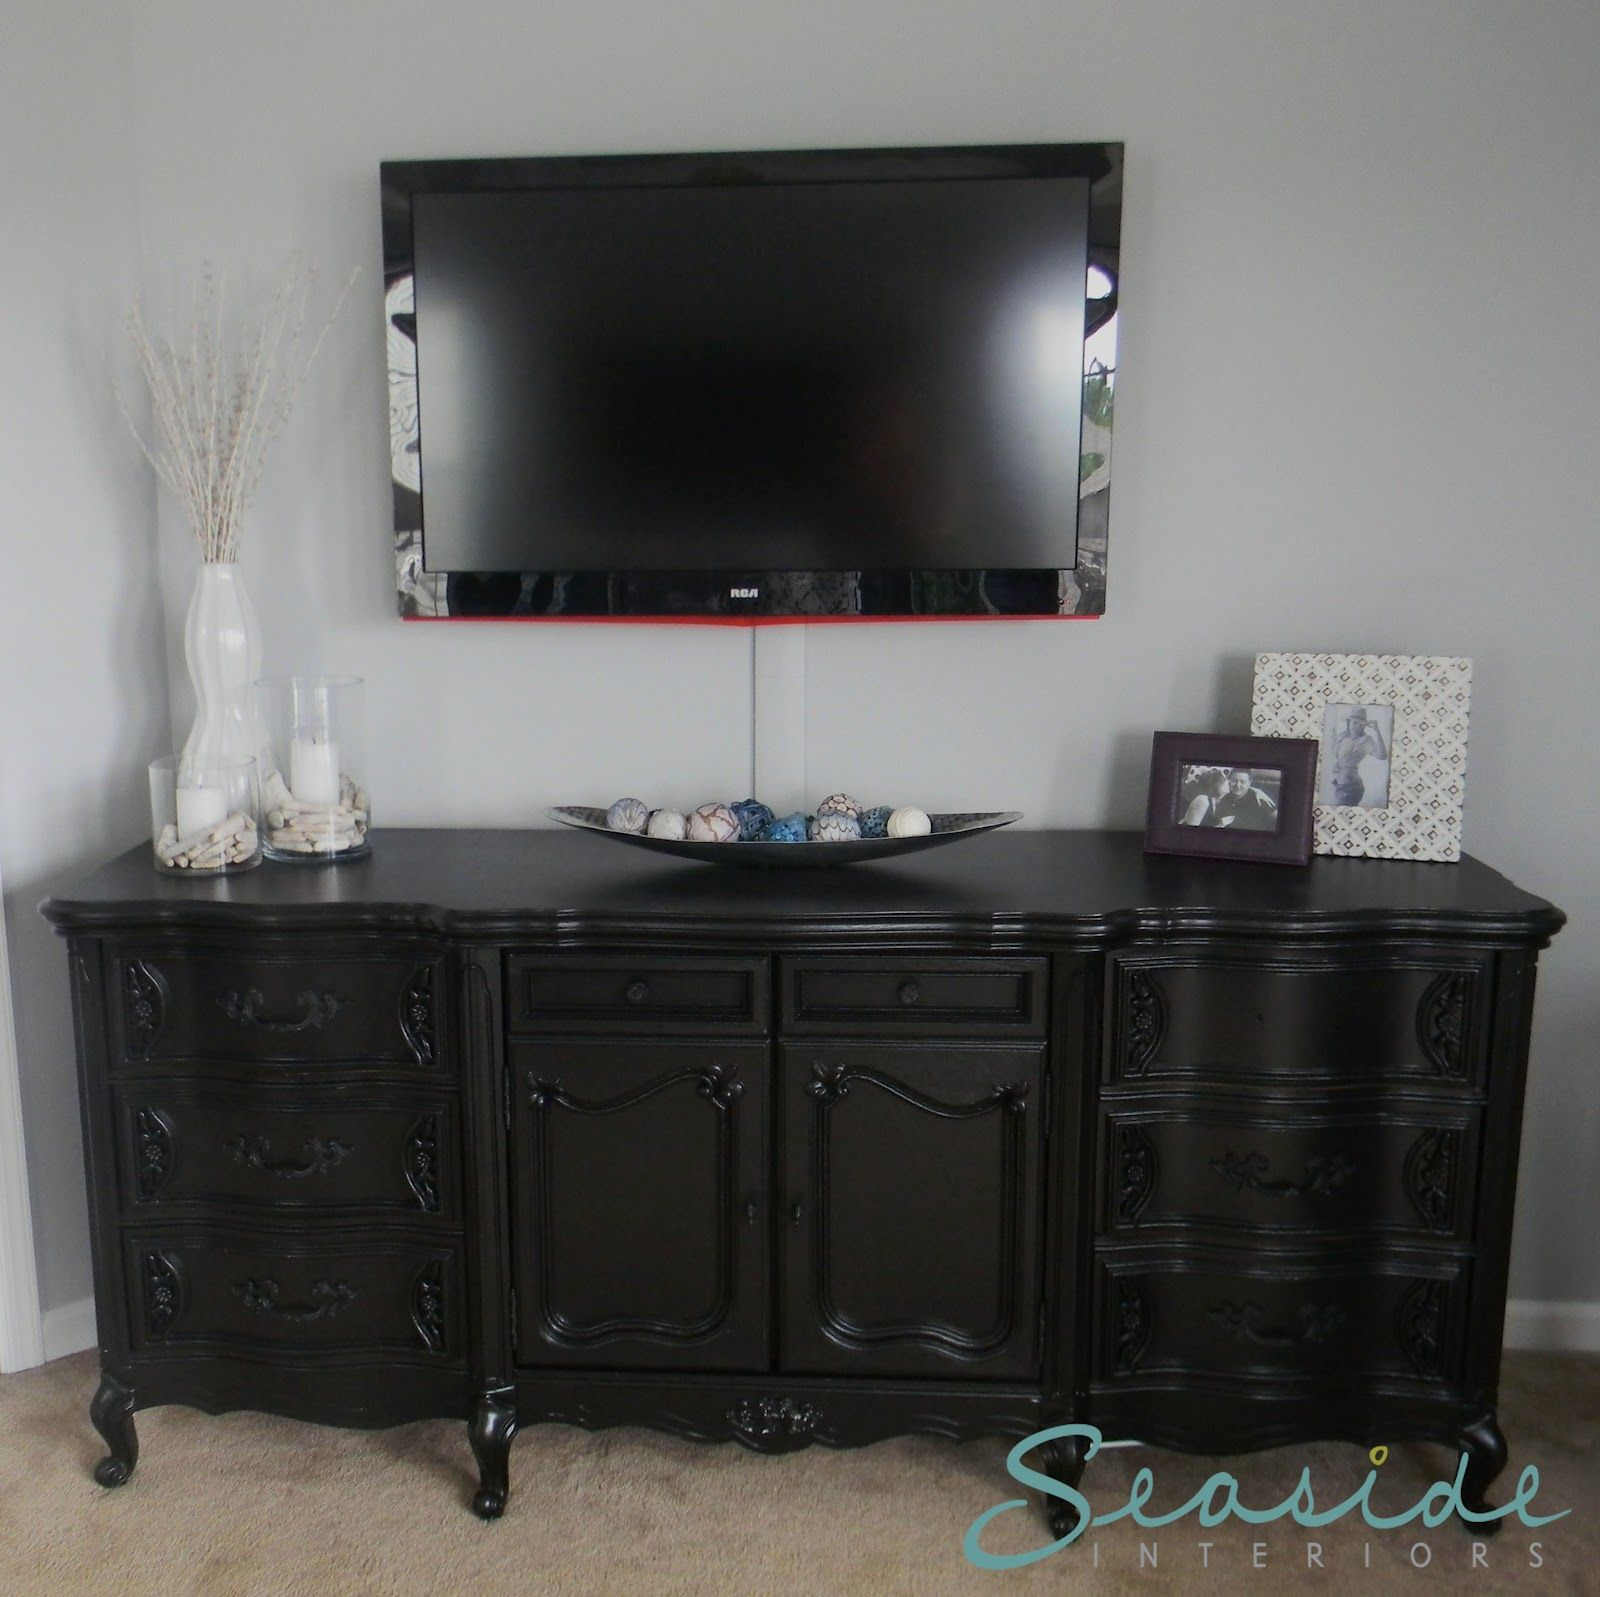 tv mounted above dresser | Home Sweet: Home | Pinterest ...